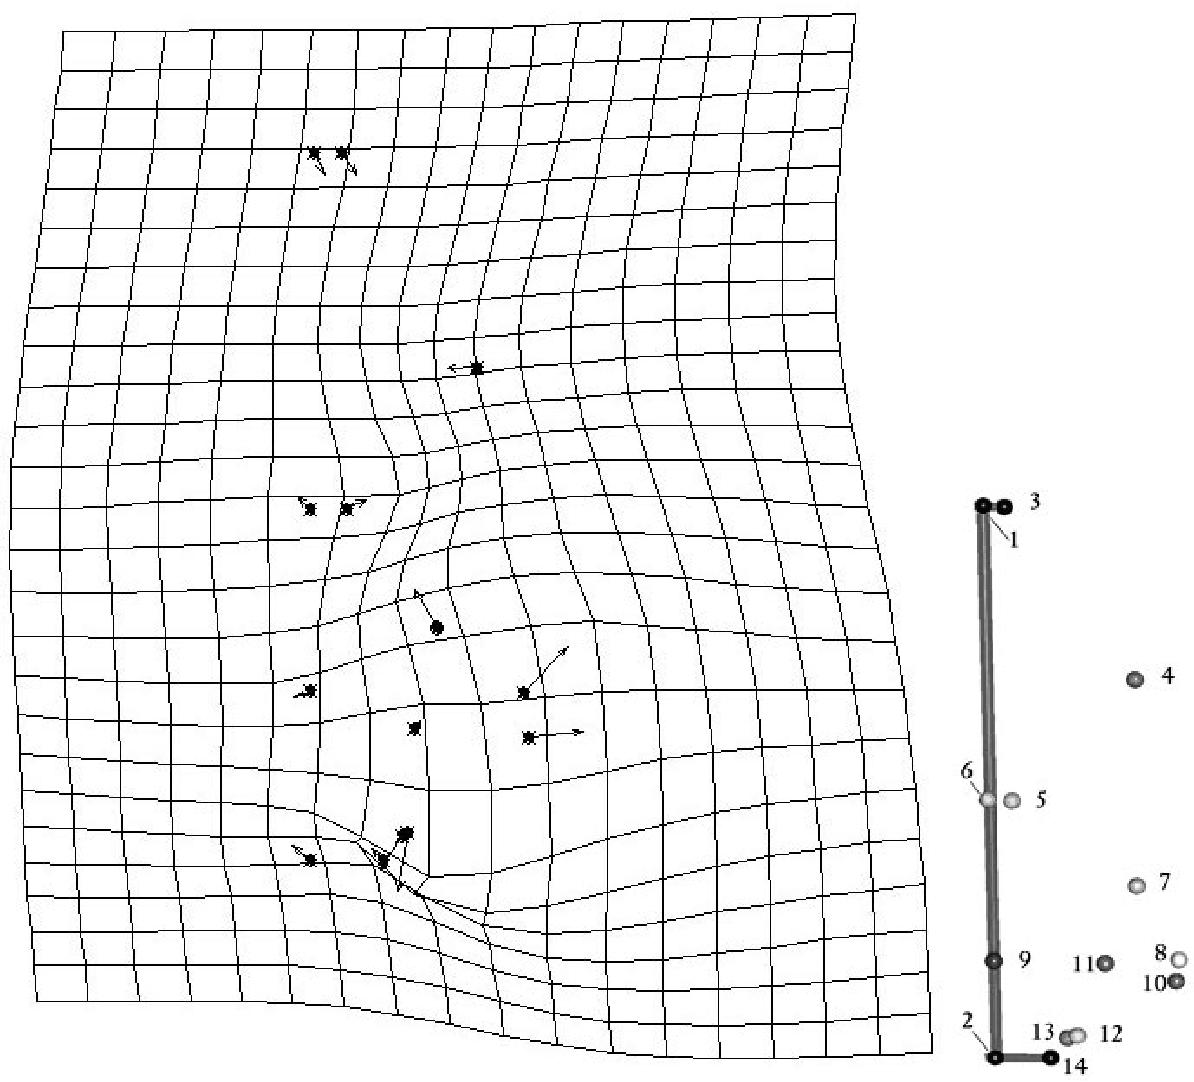 figure 5-9